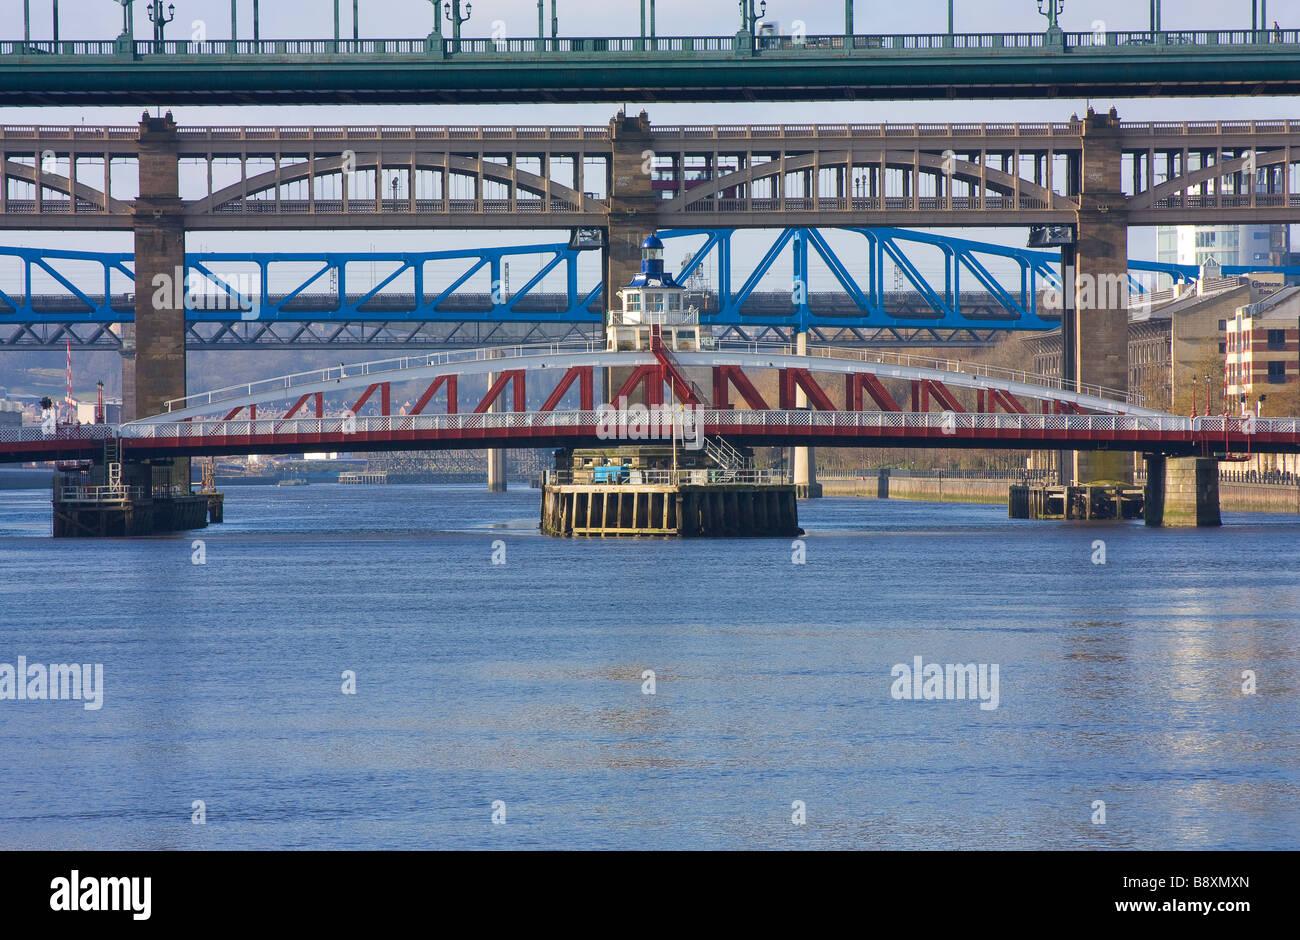 Classic view of Tyne Bridge, Swing Bridge, High level & Metro bridges spanning the River Tyne between Newcastle - Stock Image